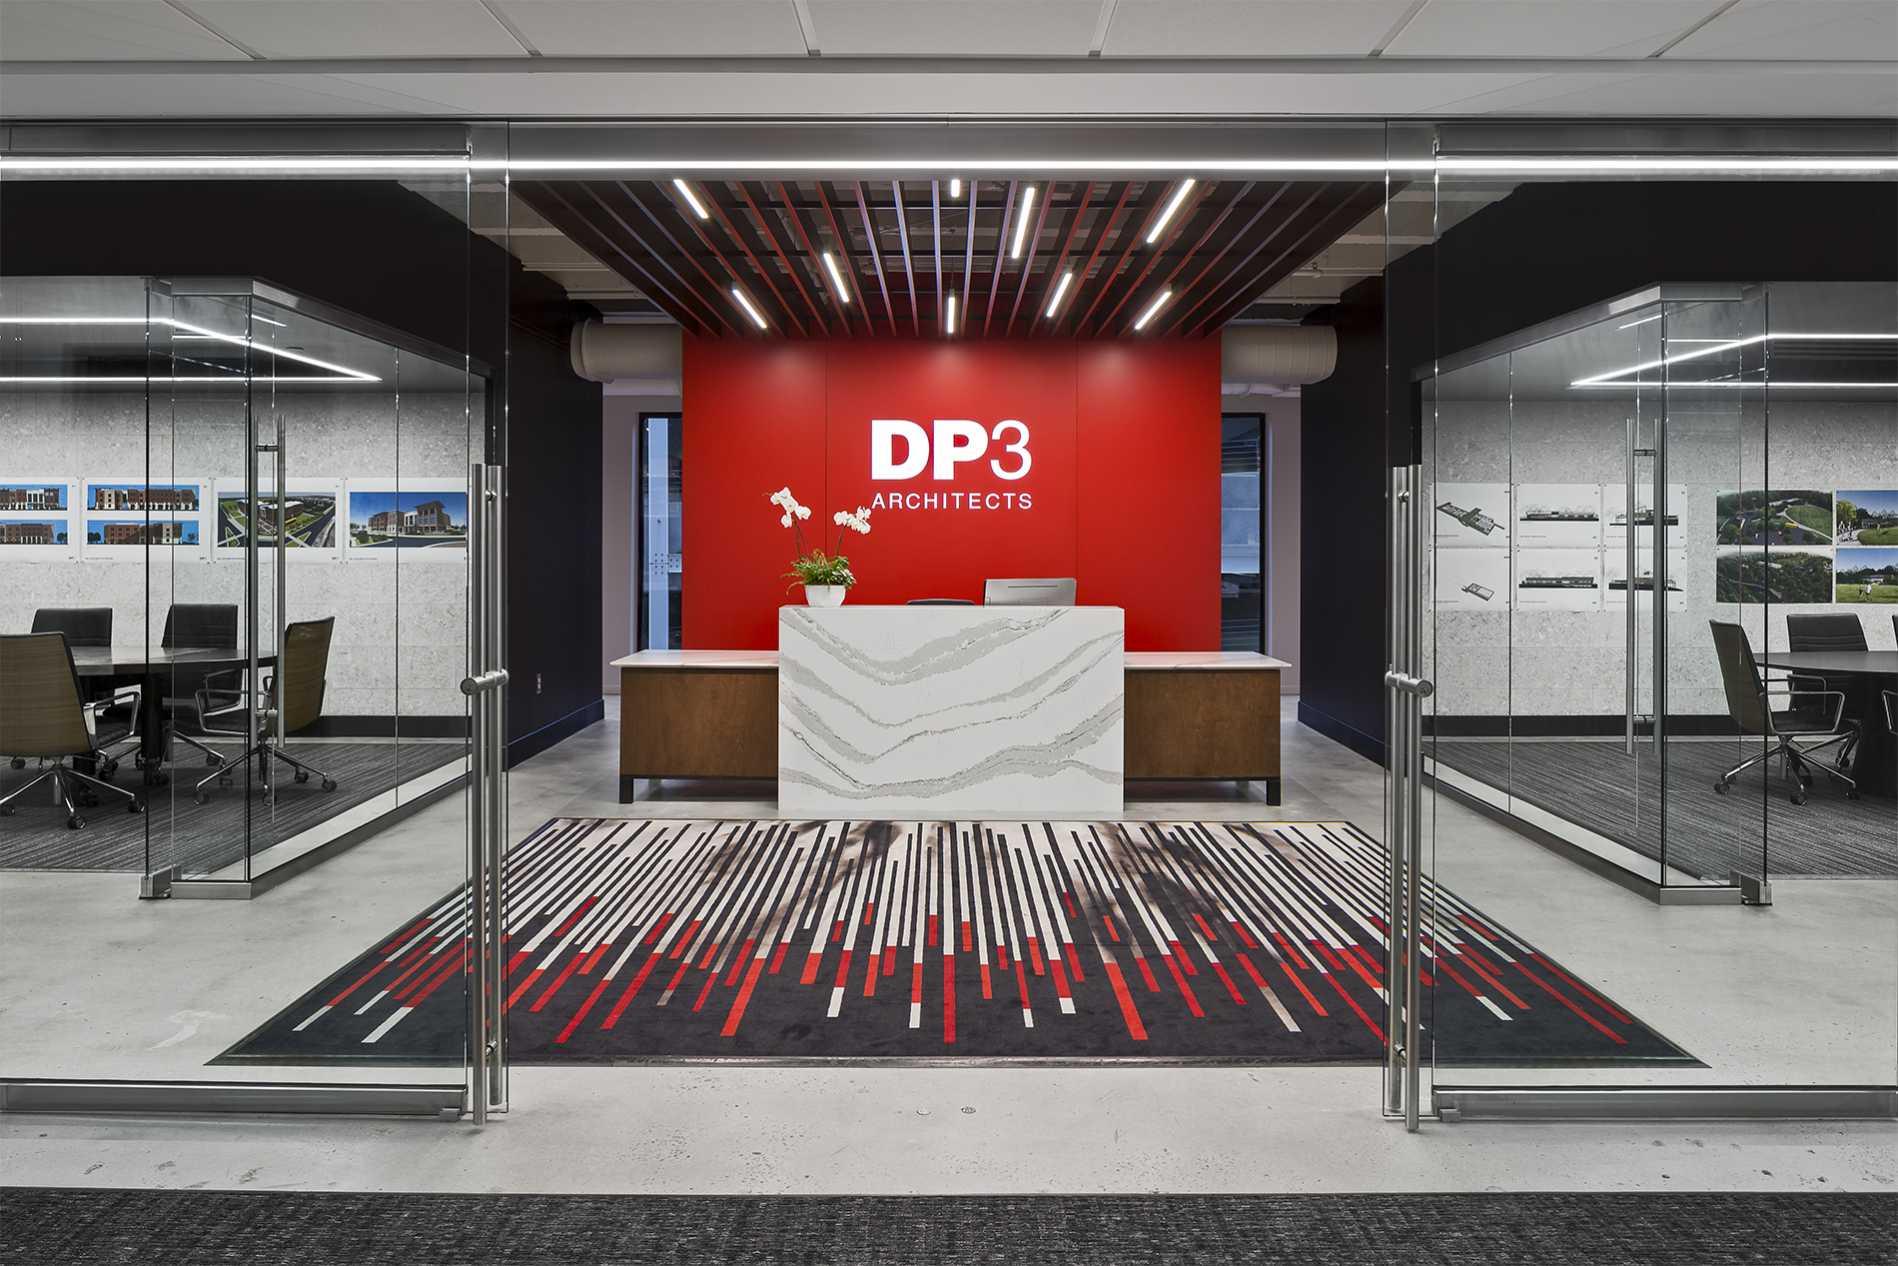 fire-station-design-firm-greenville-sc-dp3-architects | DP3